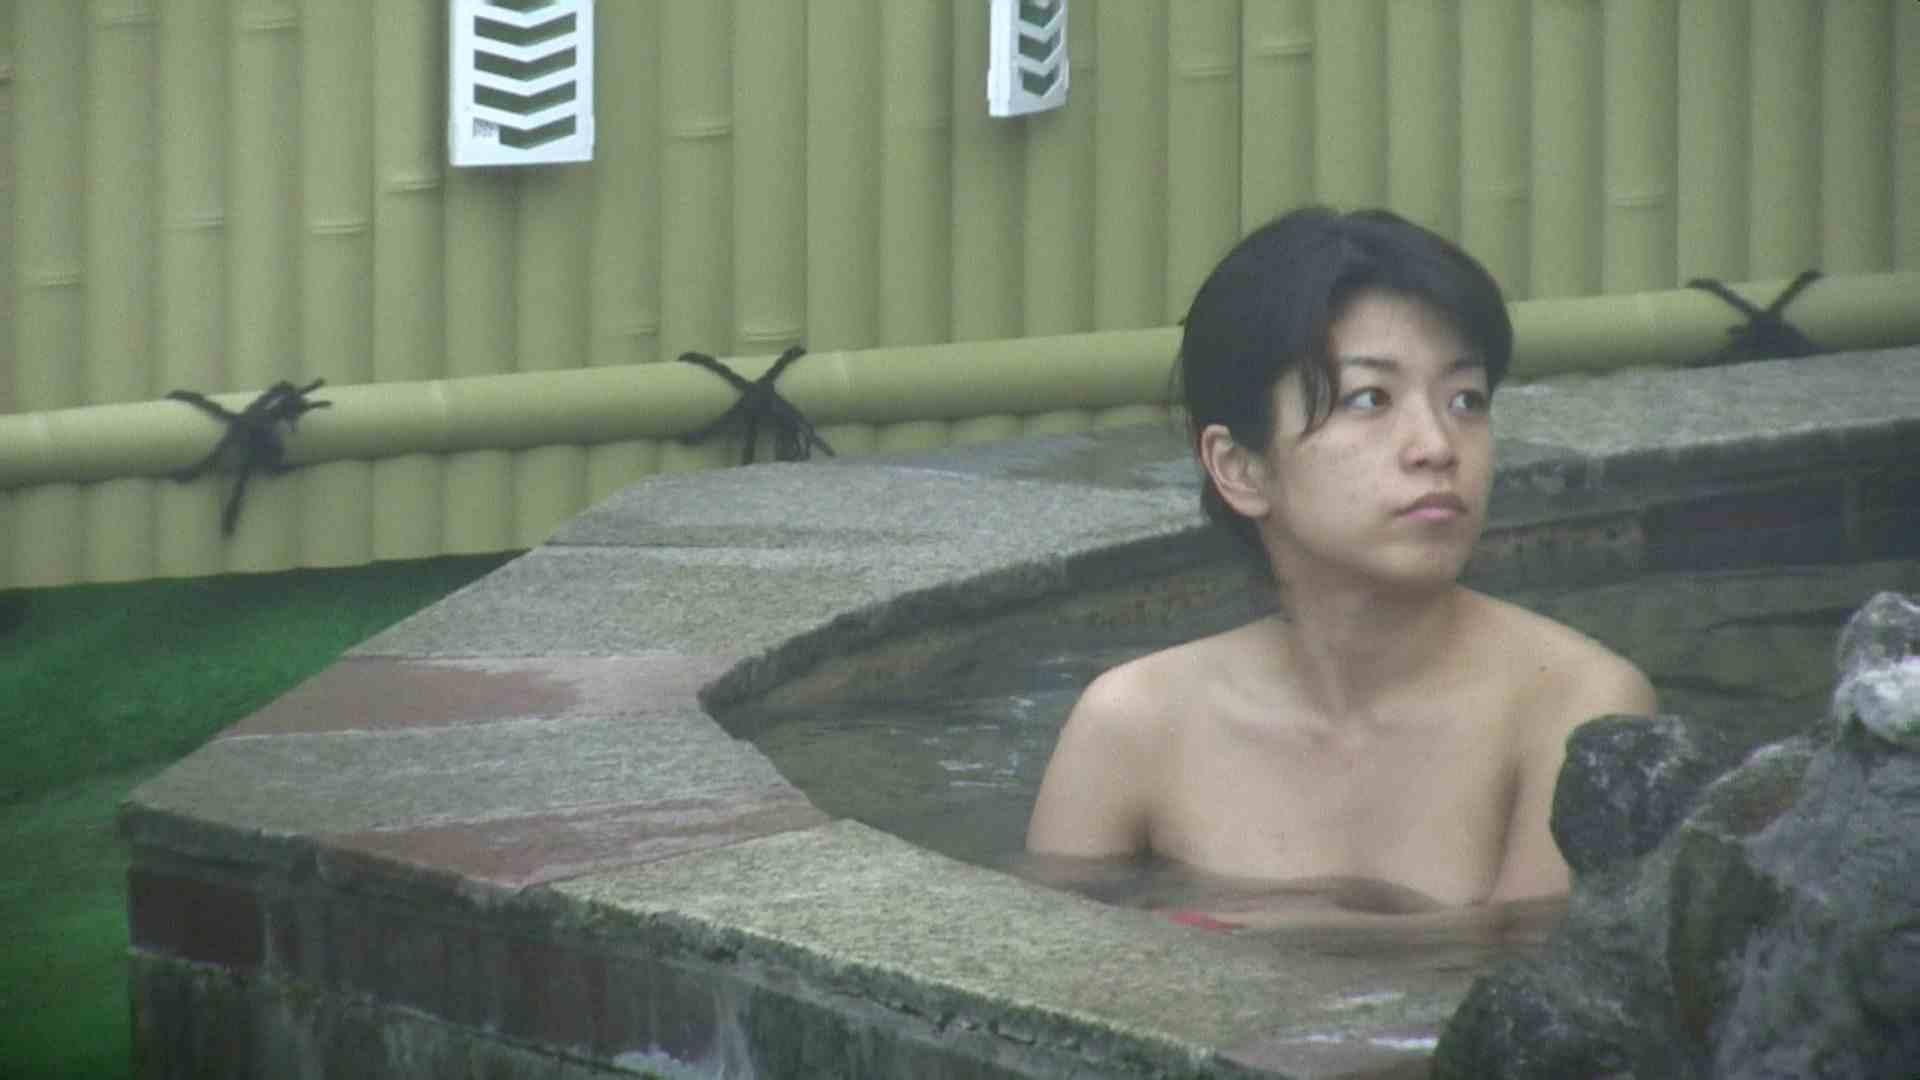 Aquaな露天風呂Vol.585 盗撮   OLセックス  51画像 16